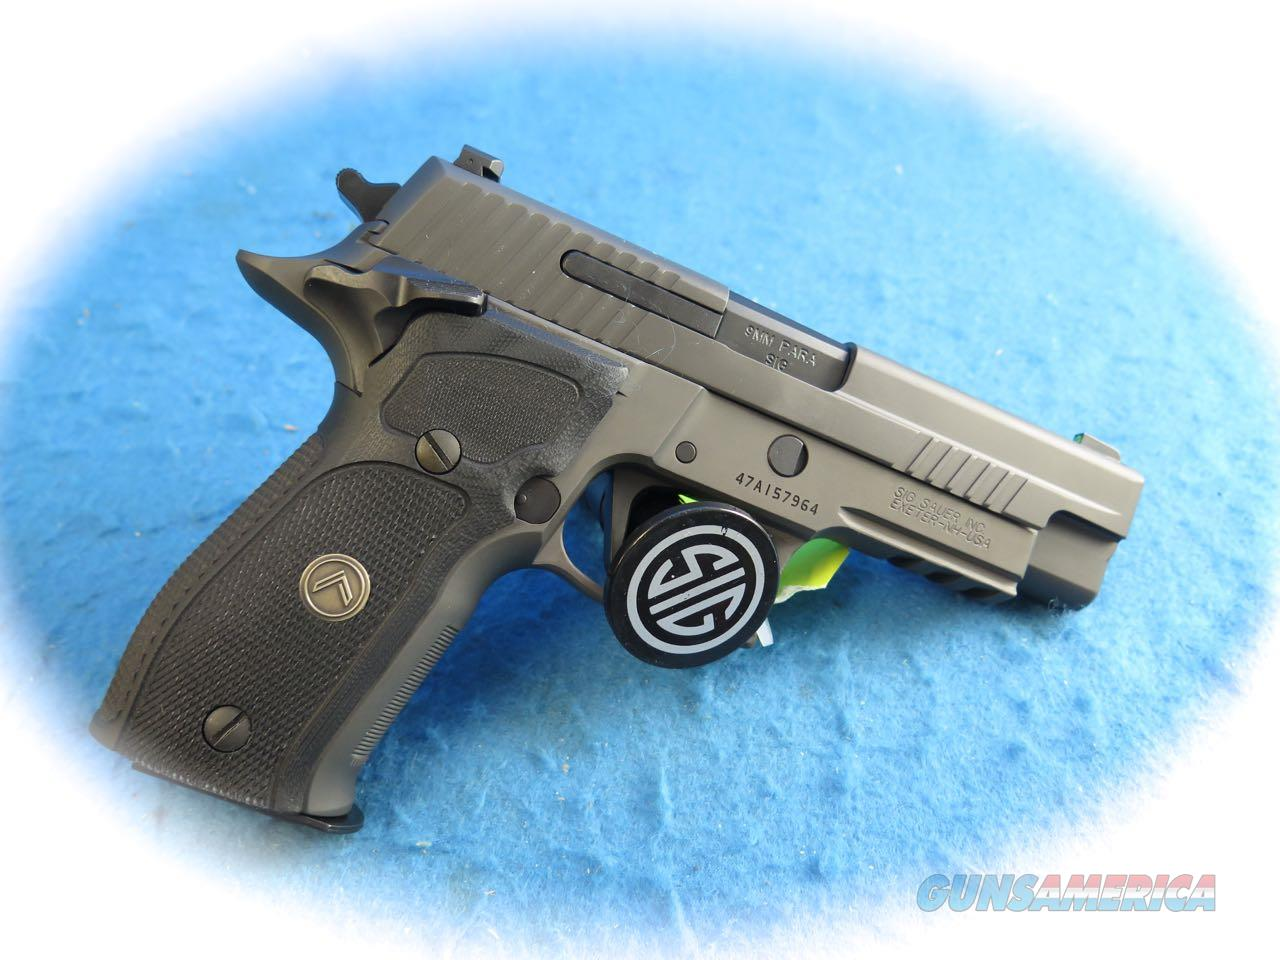 Sig Sauer P226 Legion SAO 9mm Semi Auto Pistol **New**  Guns > Pistols > Sig - Sauer/Sigarms Pistols > P226